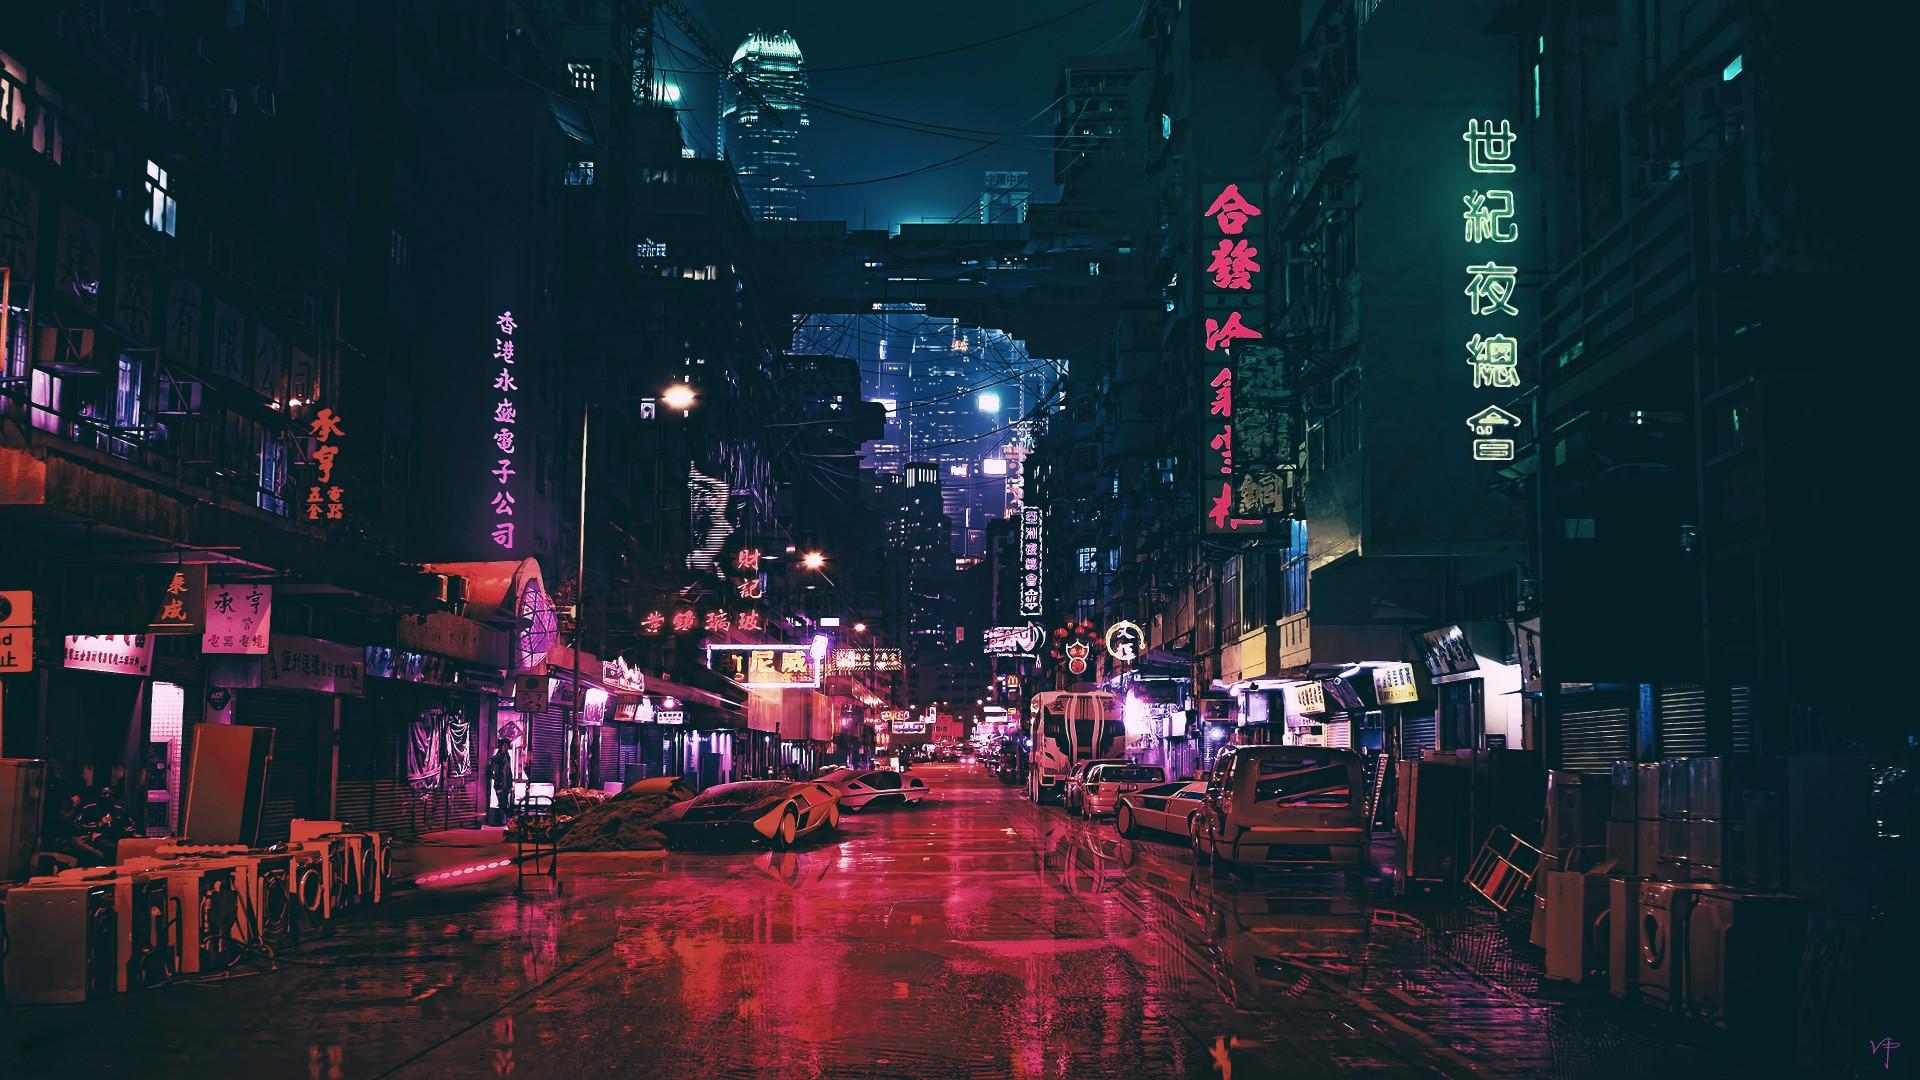 Wallpaper Futuristic Future World Night 4k Art 20316